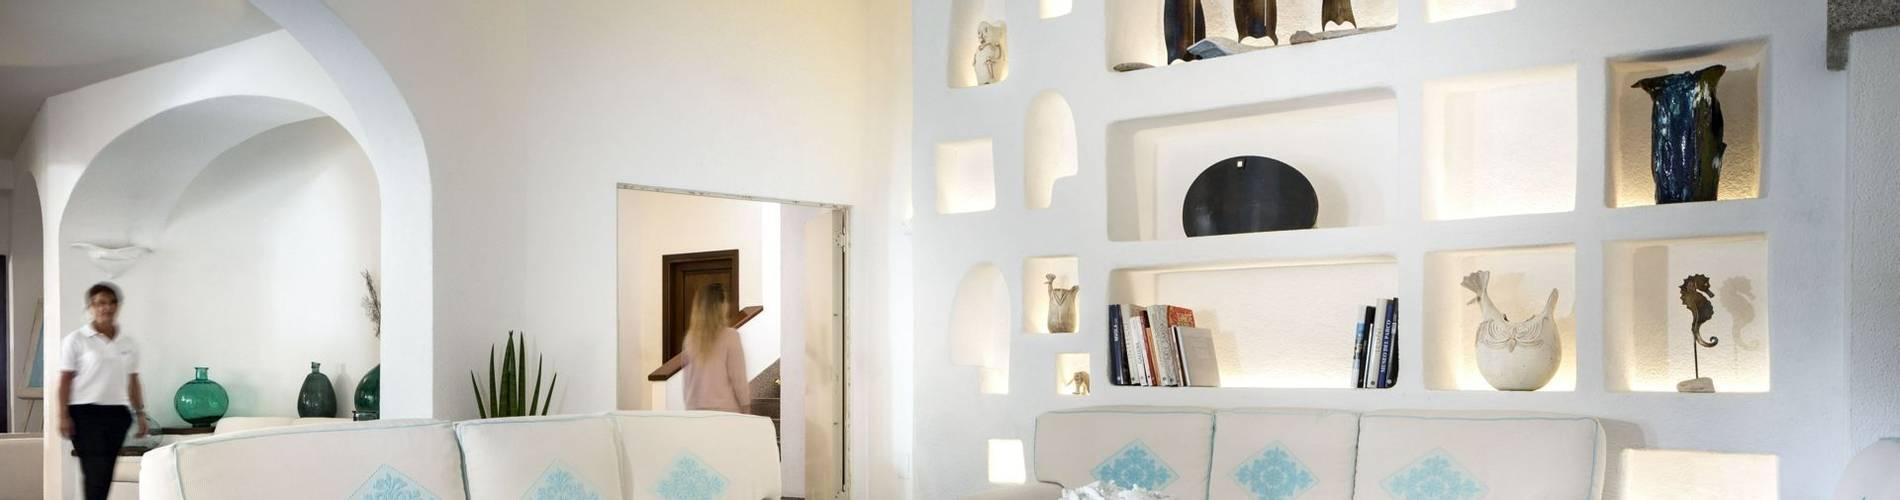 Gabbiano Azzurro Hotel _ Suites - Hall.jpg